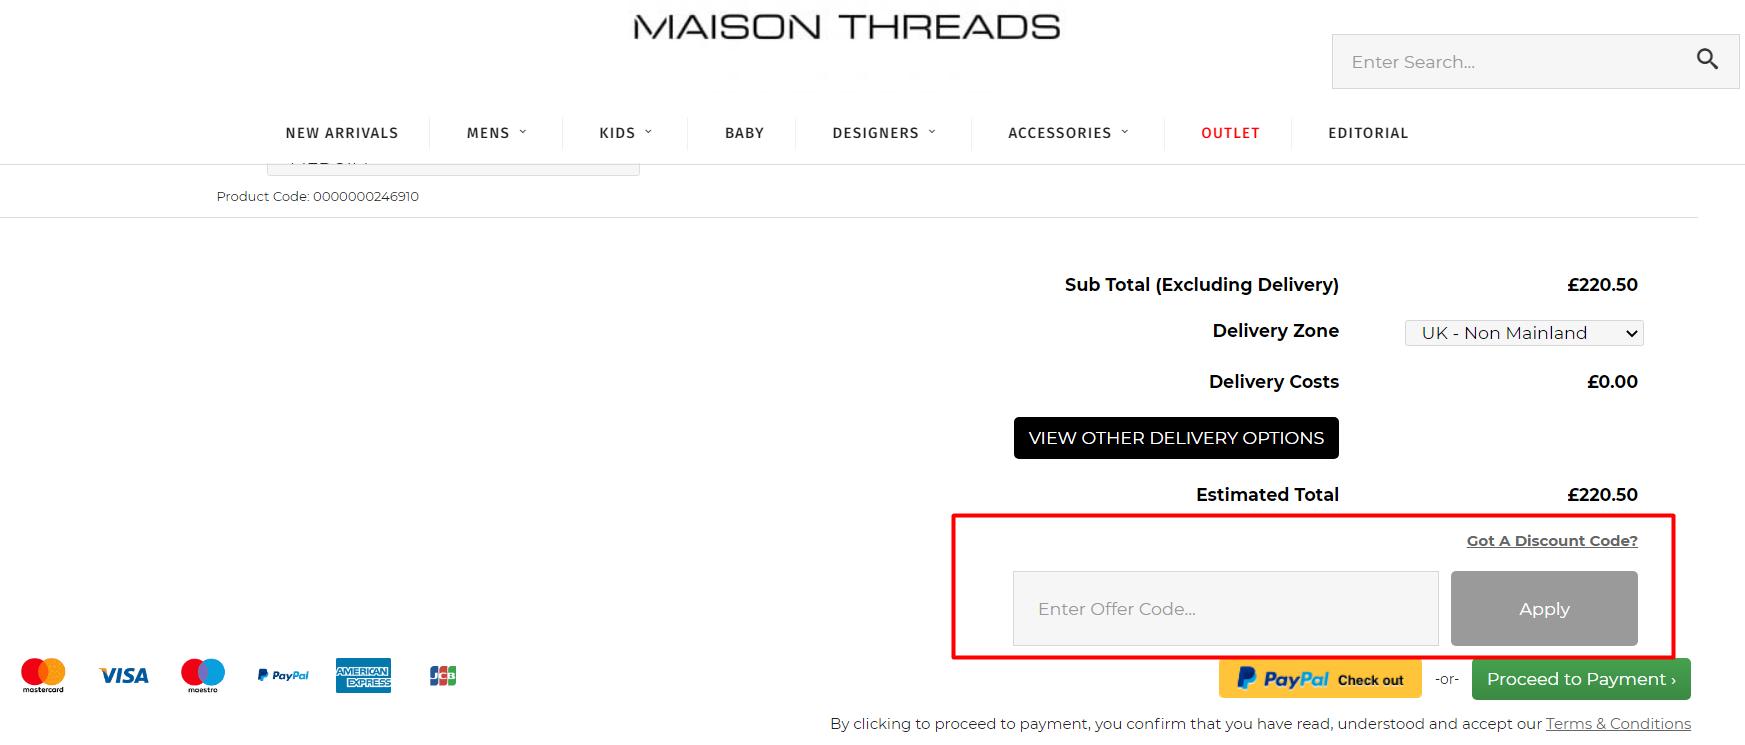 How do I use my Maison Threads discount code?